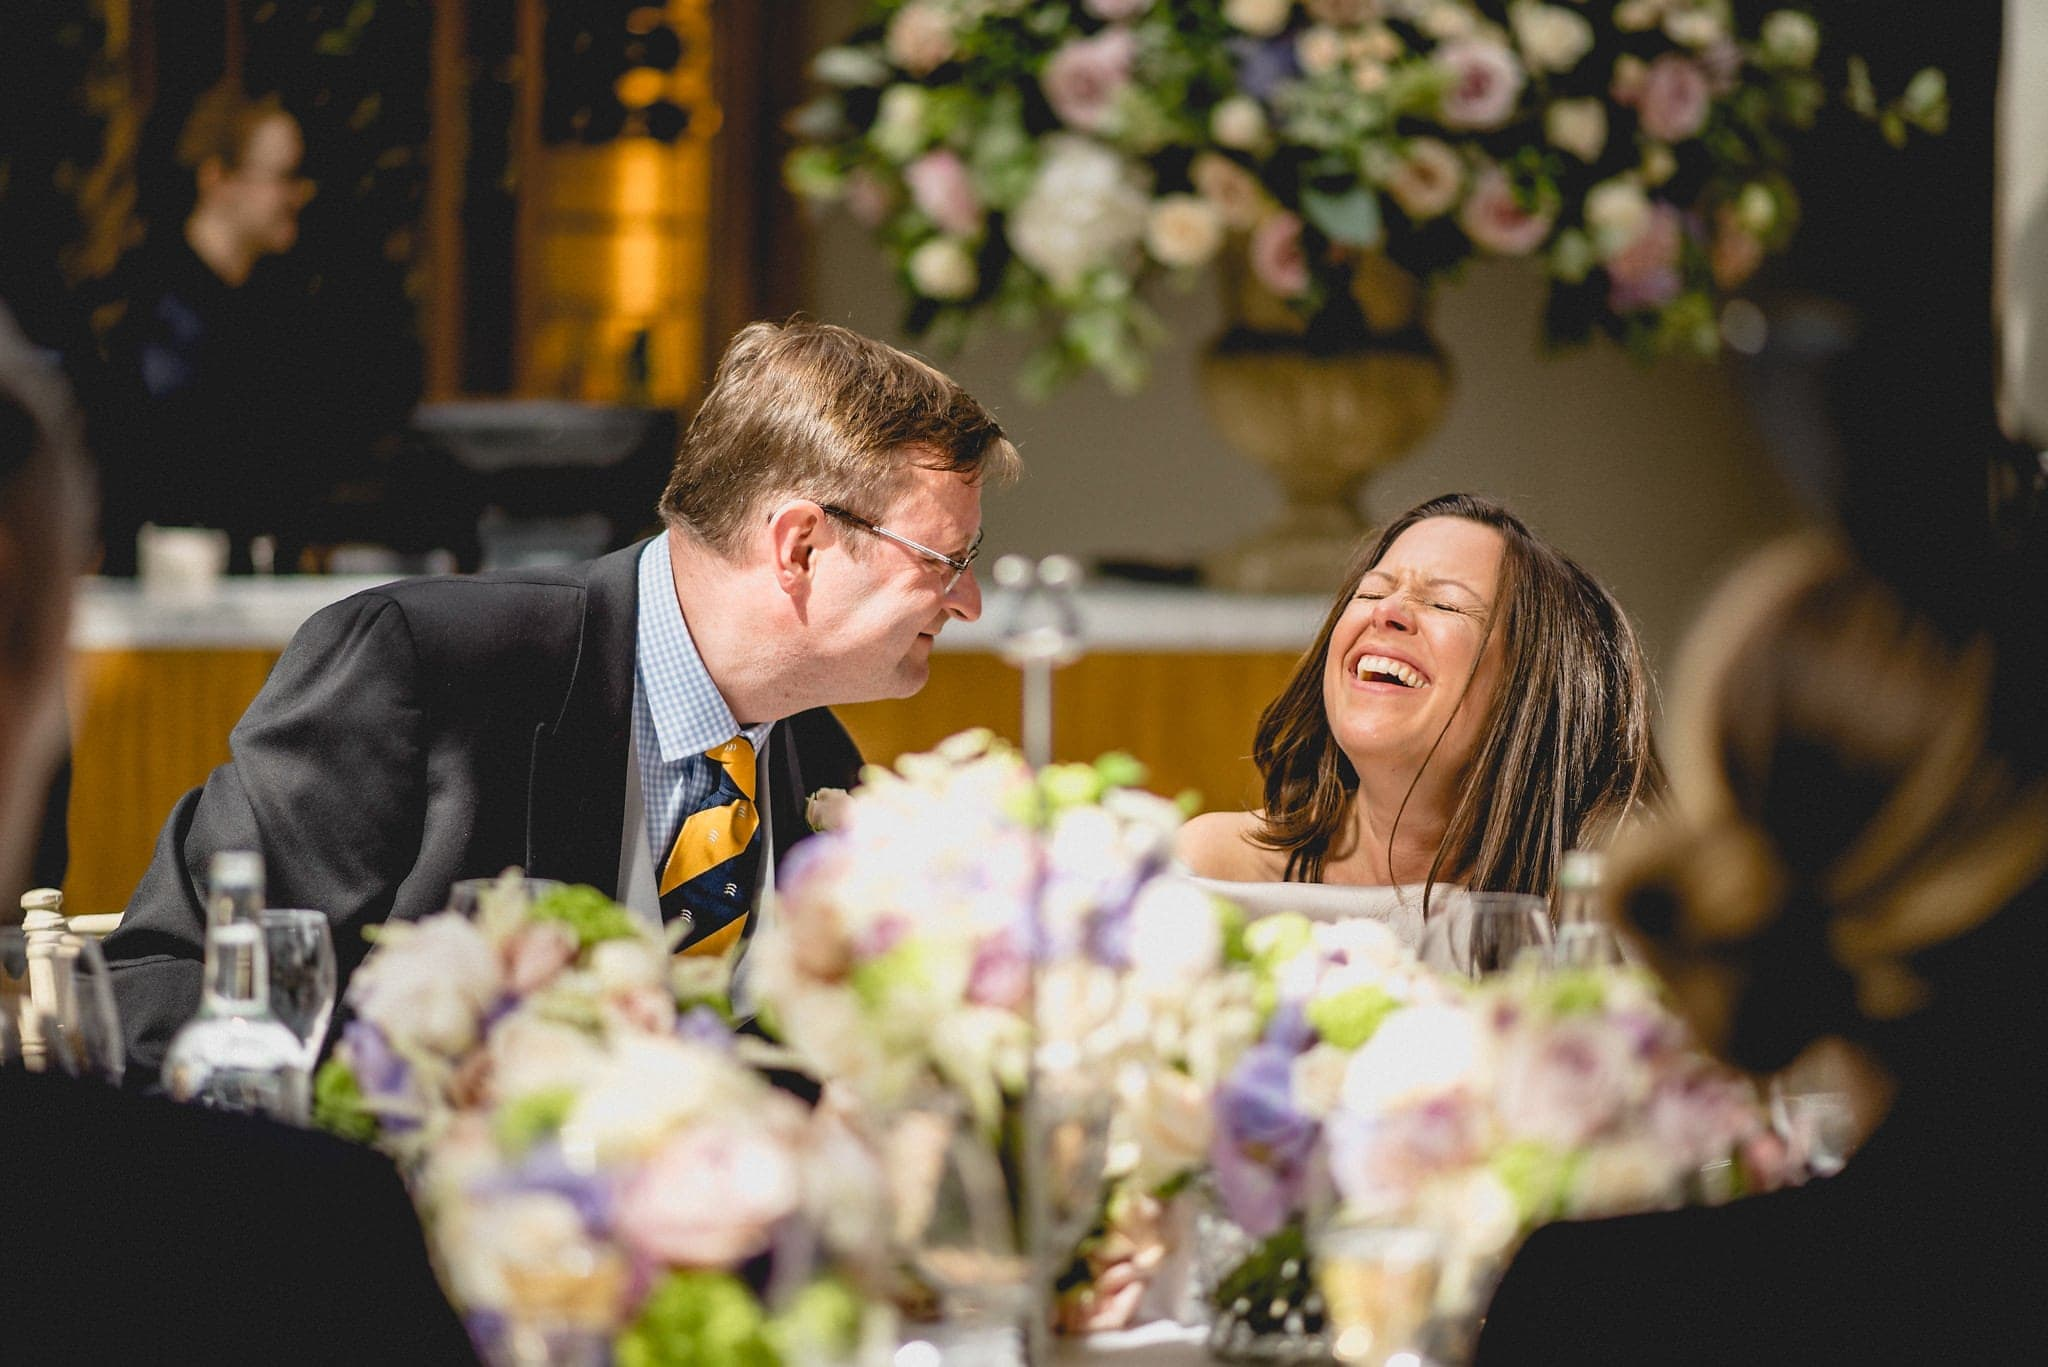 Groom makes bride laugh during speeches